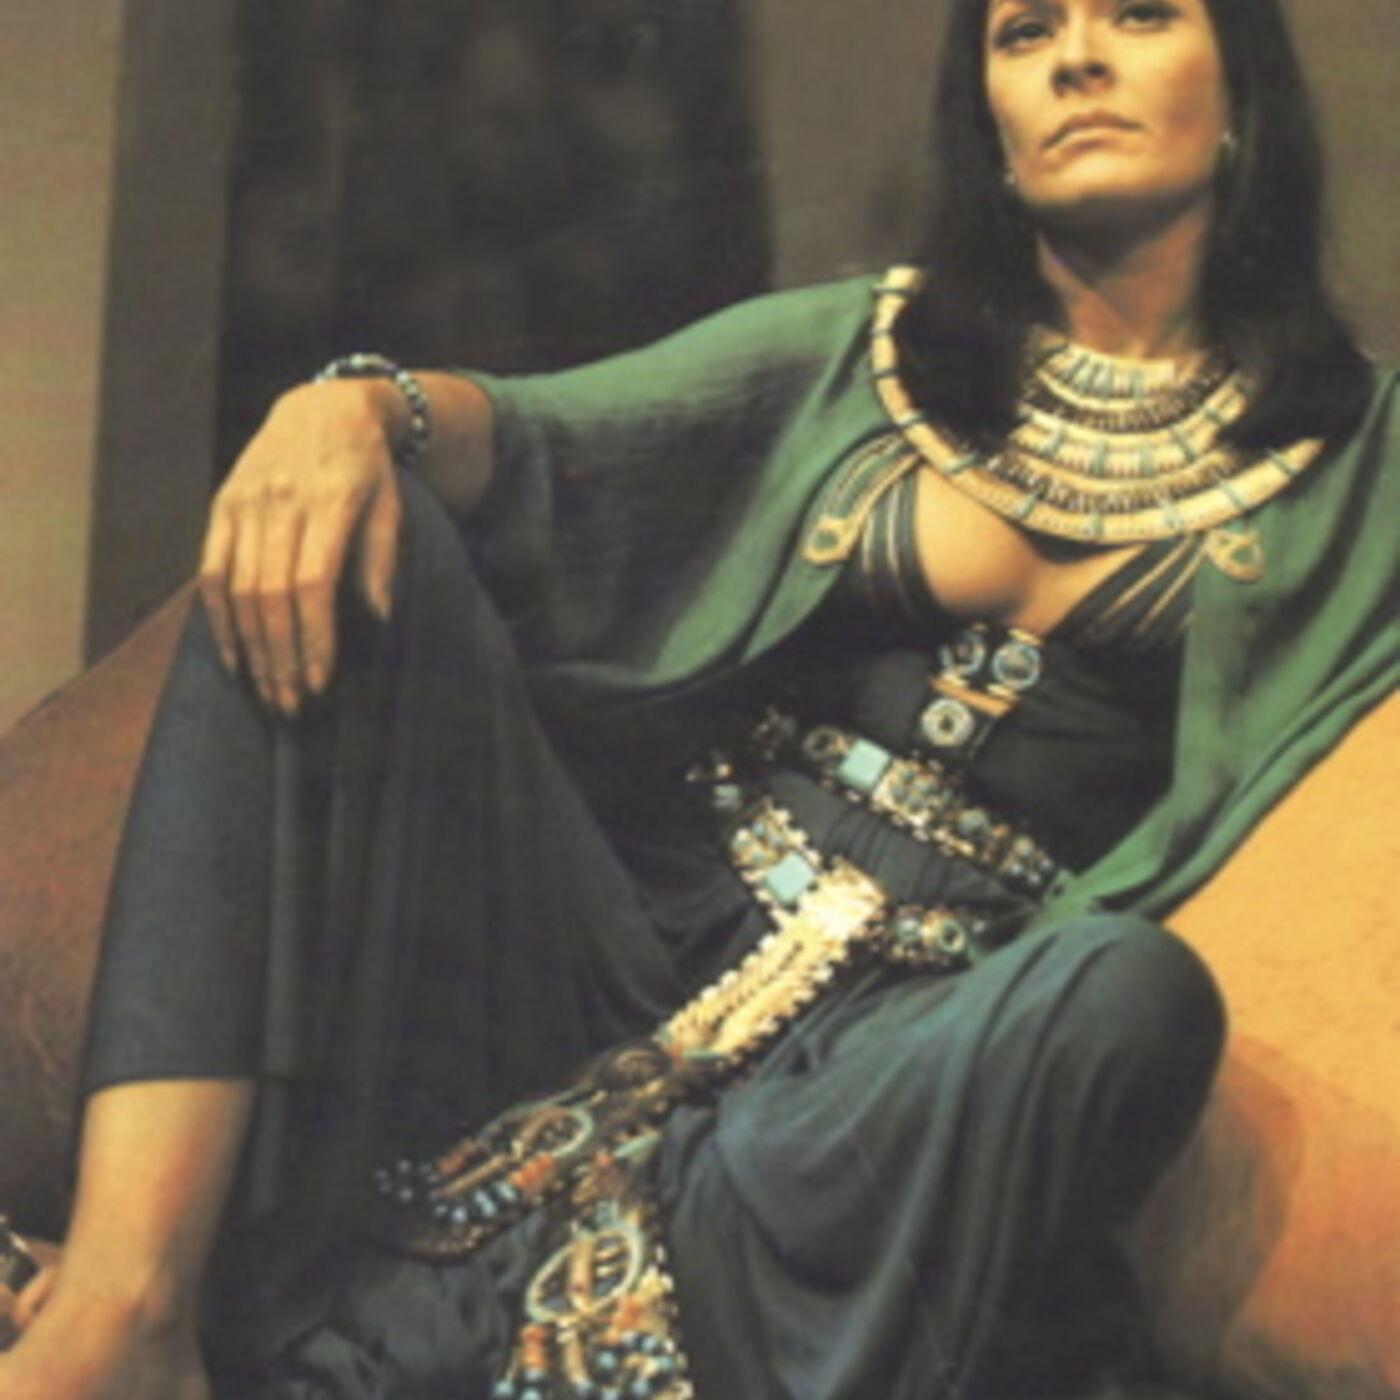 S1:E6: Janet Suzman on Hamlet, Othello, Antony & Cleopatra